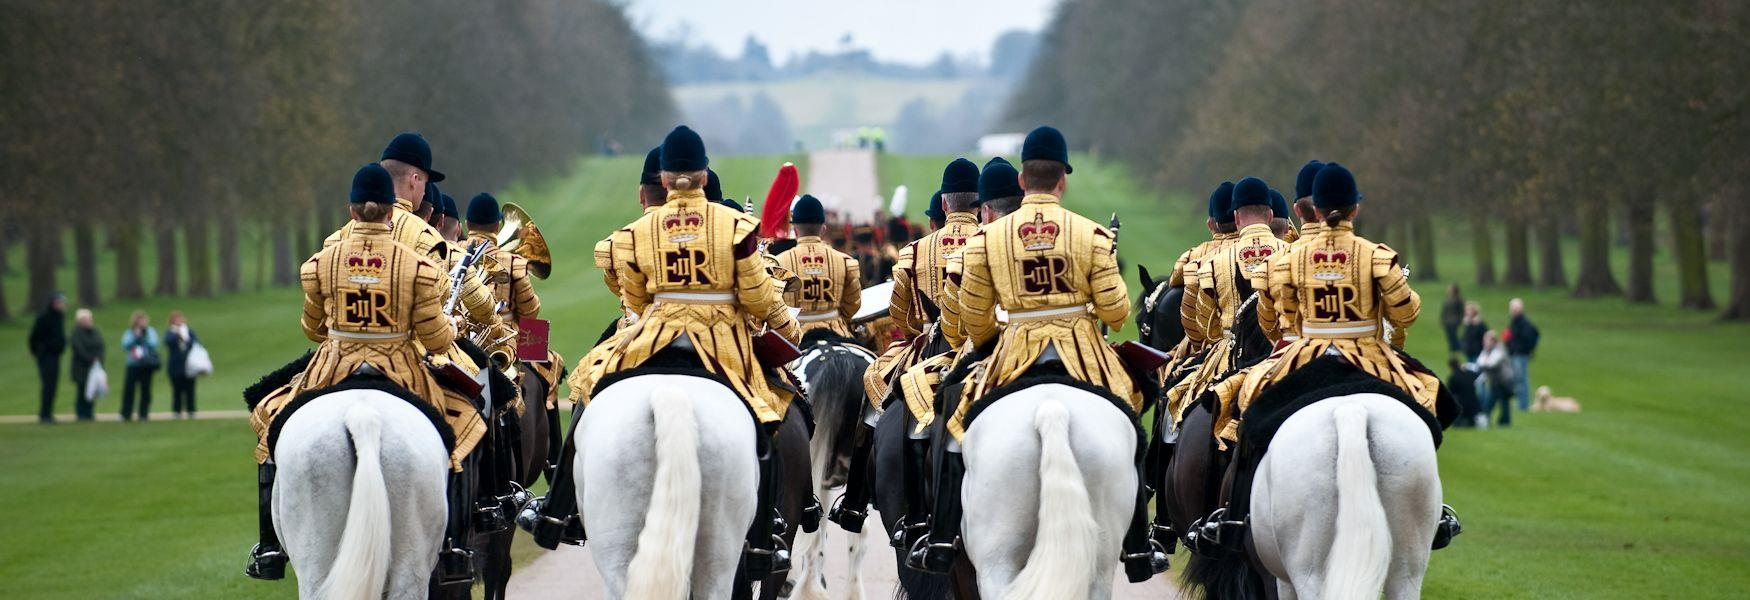 Mounted Band of the Household Cavalry - Doug Harding